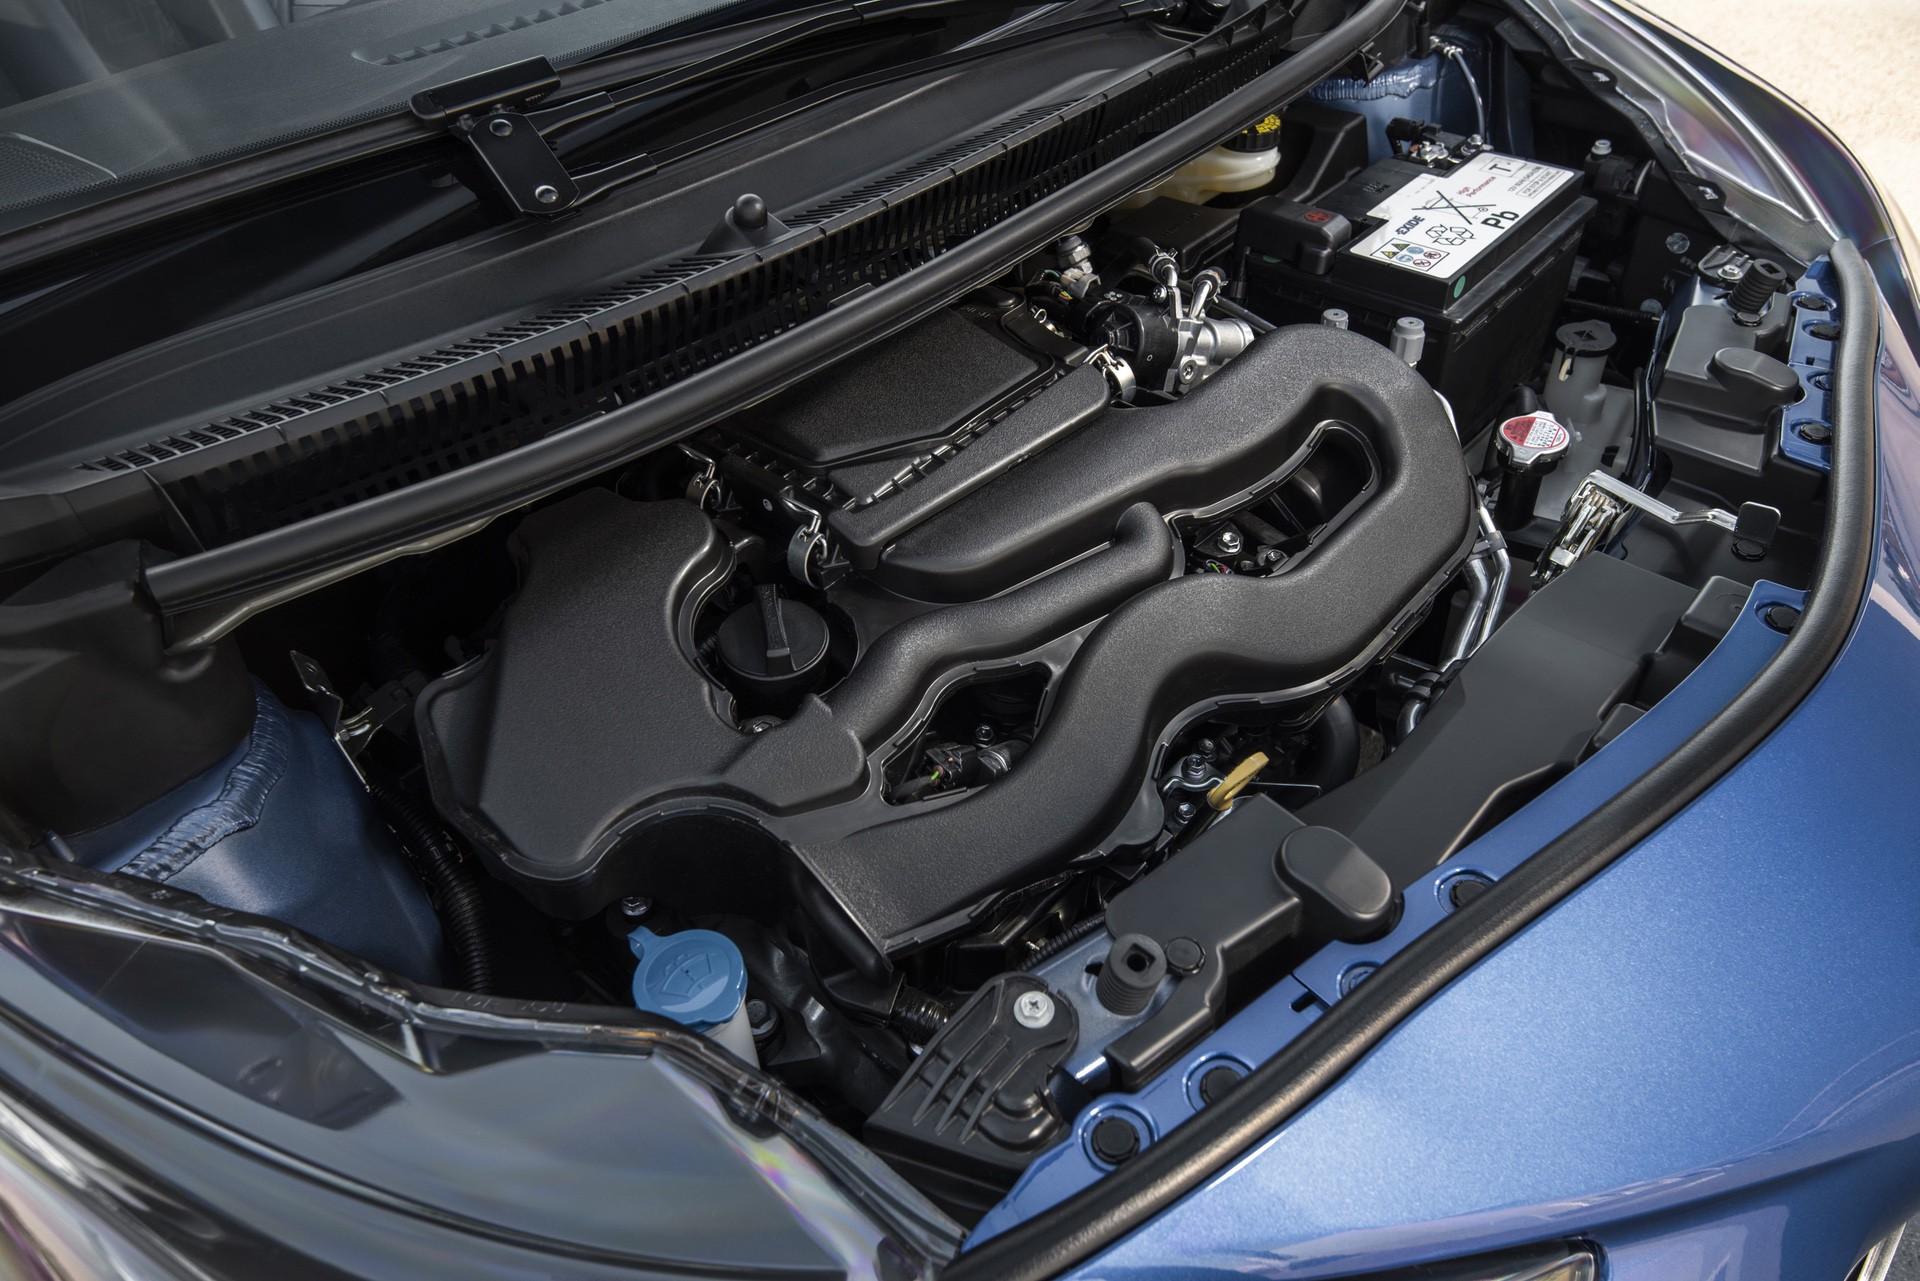 Toyota_Aygo_facelift_presskit_0036